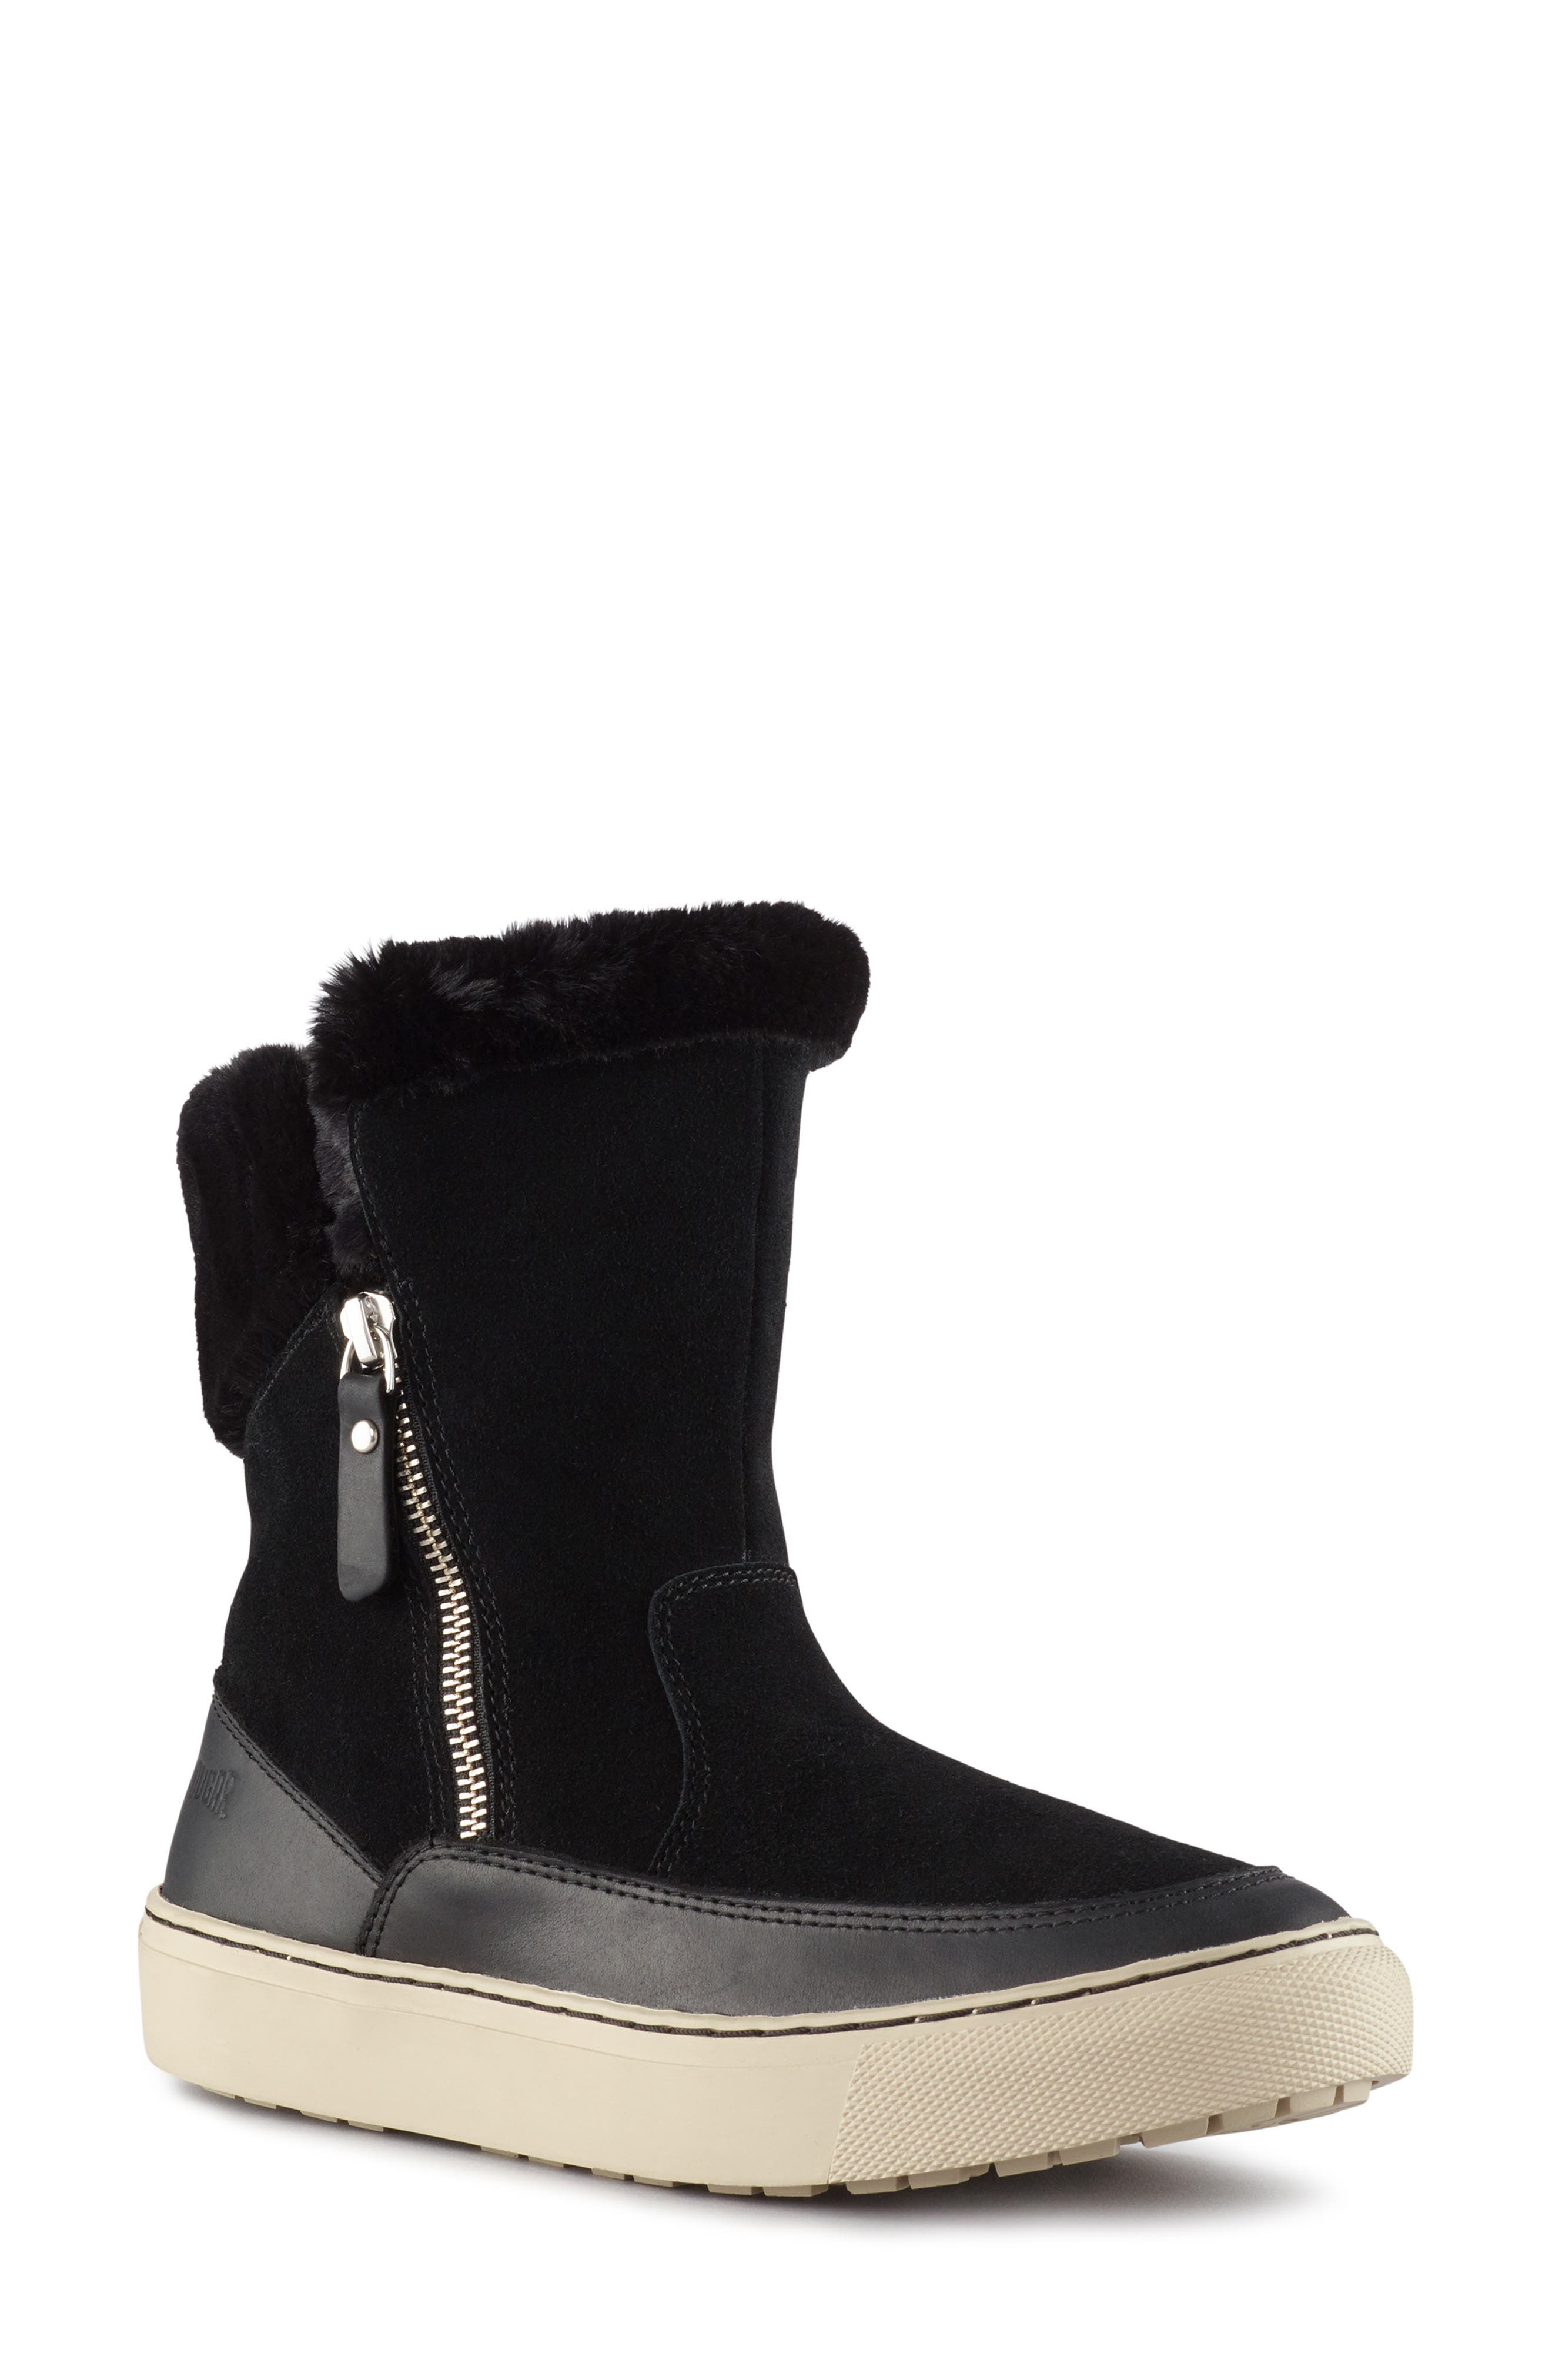 Dresden Waterproof Sneaker Boot with Faux Fur Trim,                             Main thumbnail 1, color,                             001